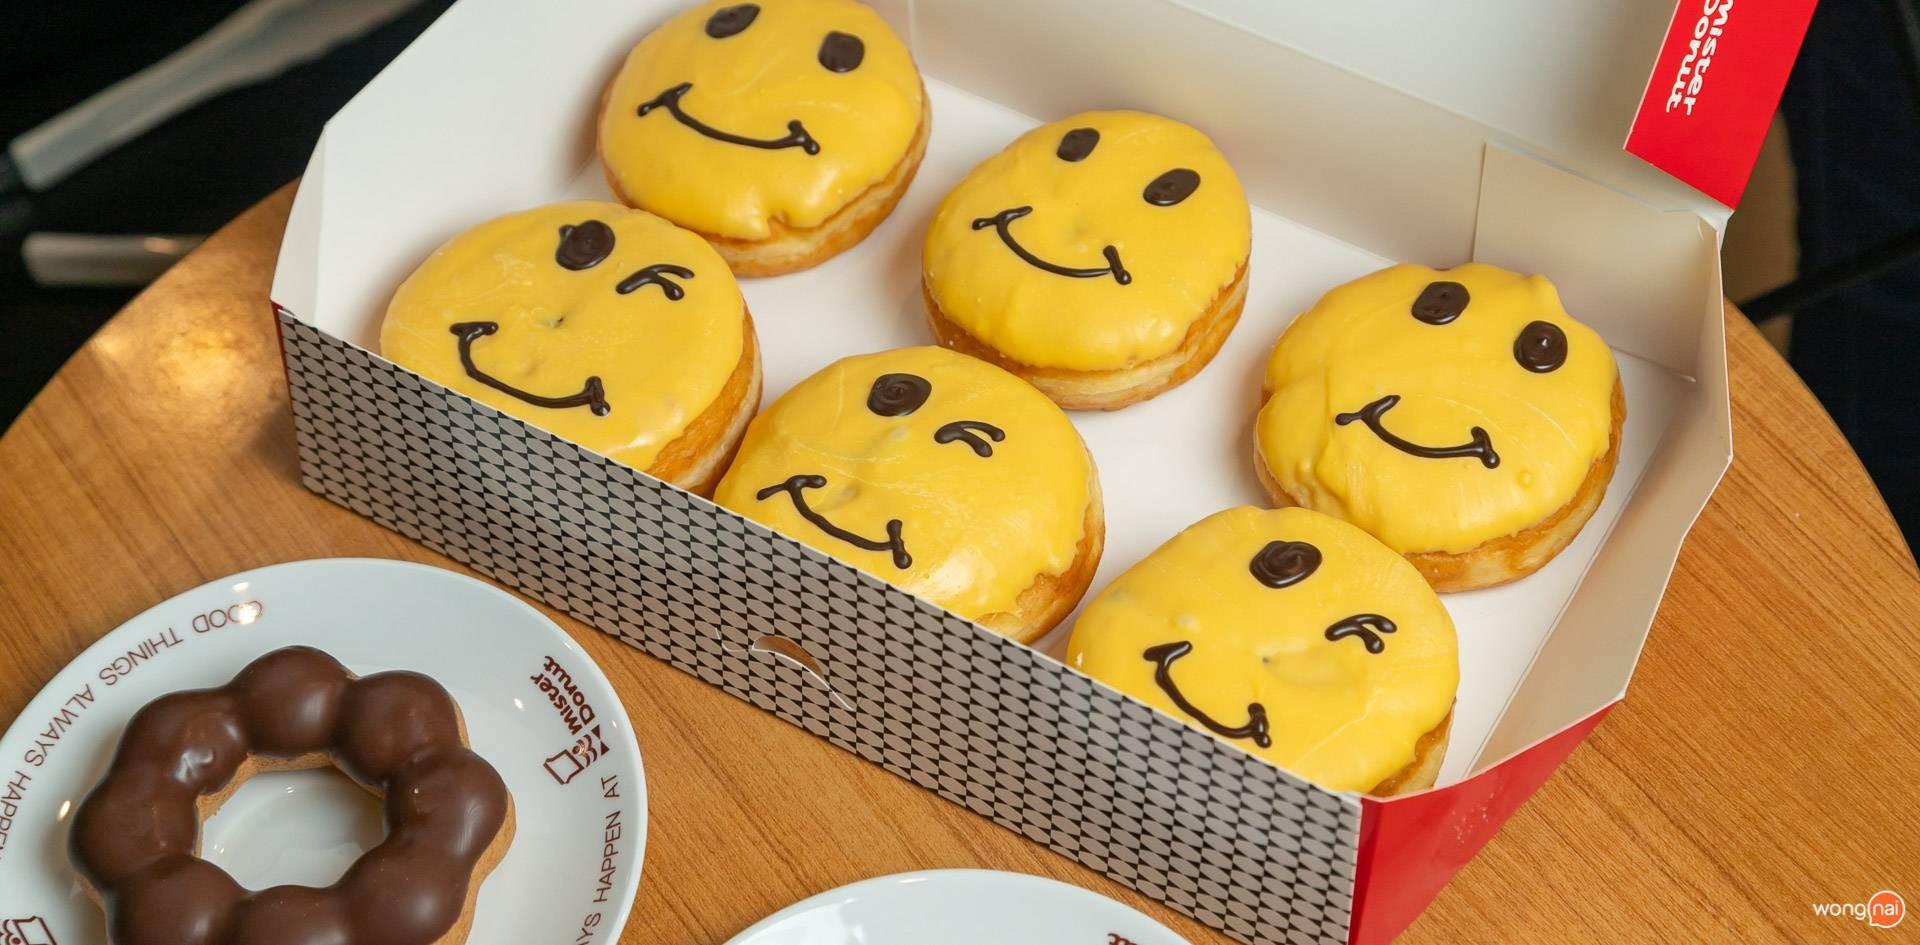 Mister Donut ศูนย์การค้าเซ็นทรัลพลาซา แกรนด์ พระราม 9